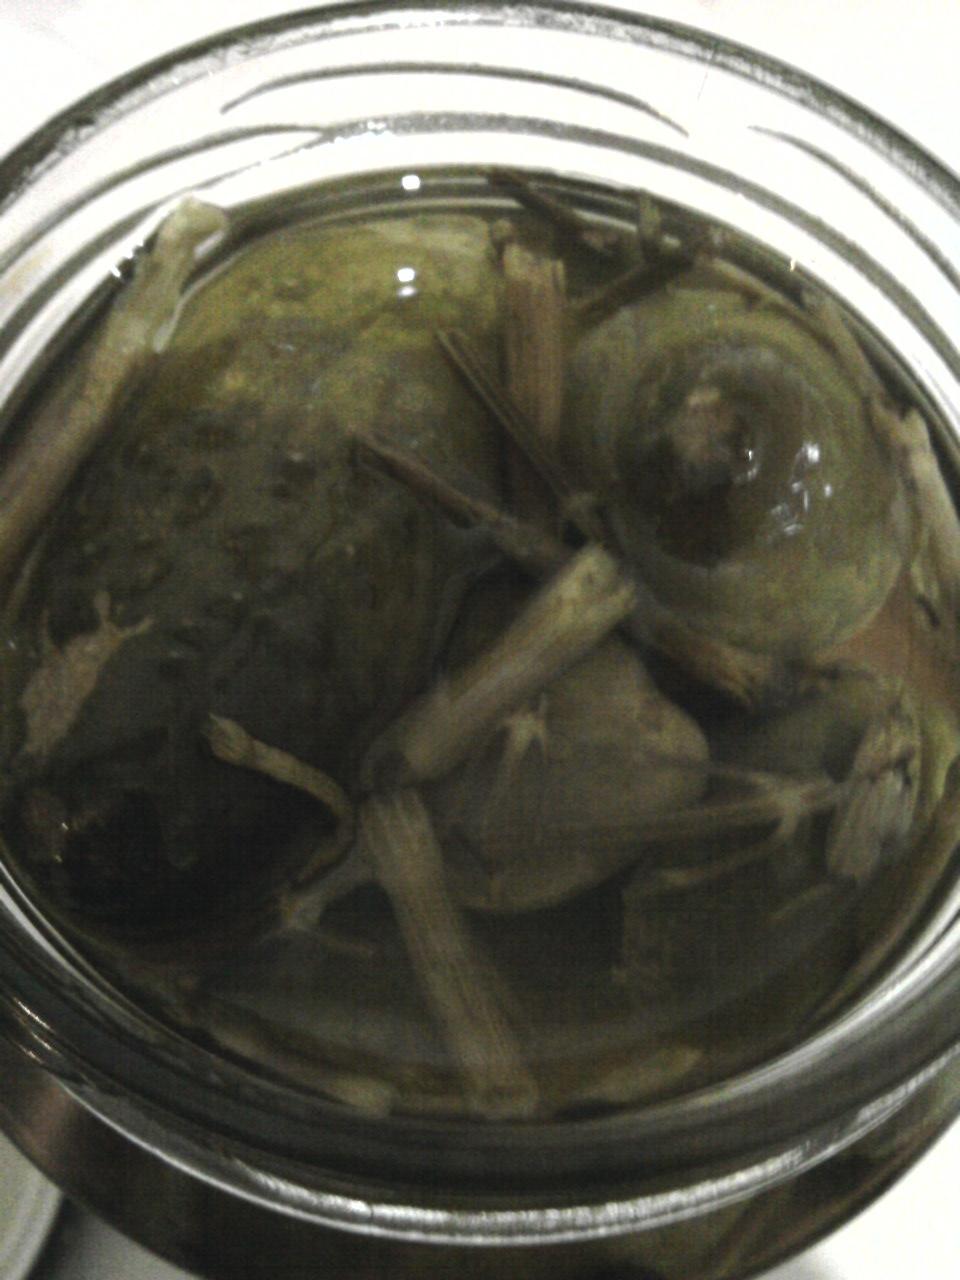 Rivona Rokiškio Marinuoti Agurkai Pickled Cucumbers open jar